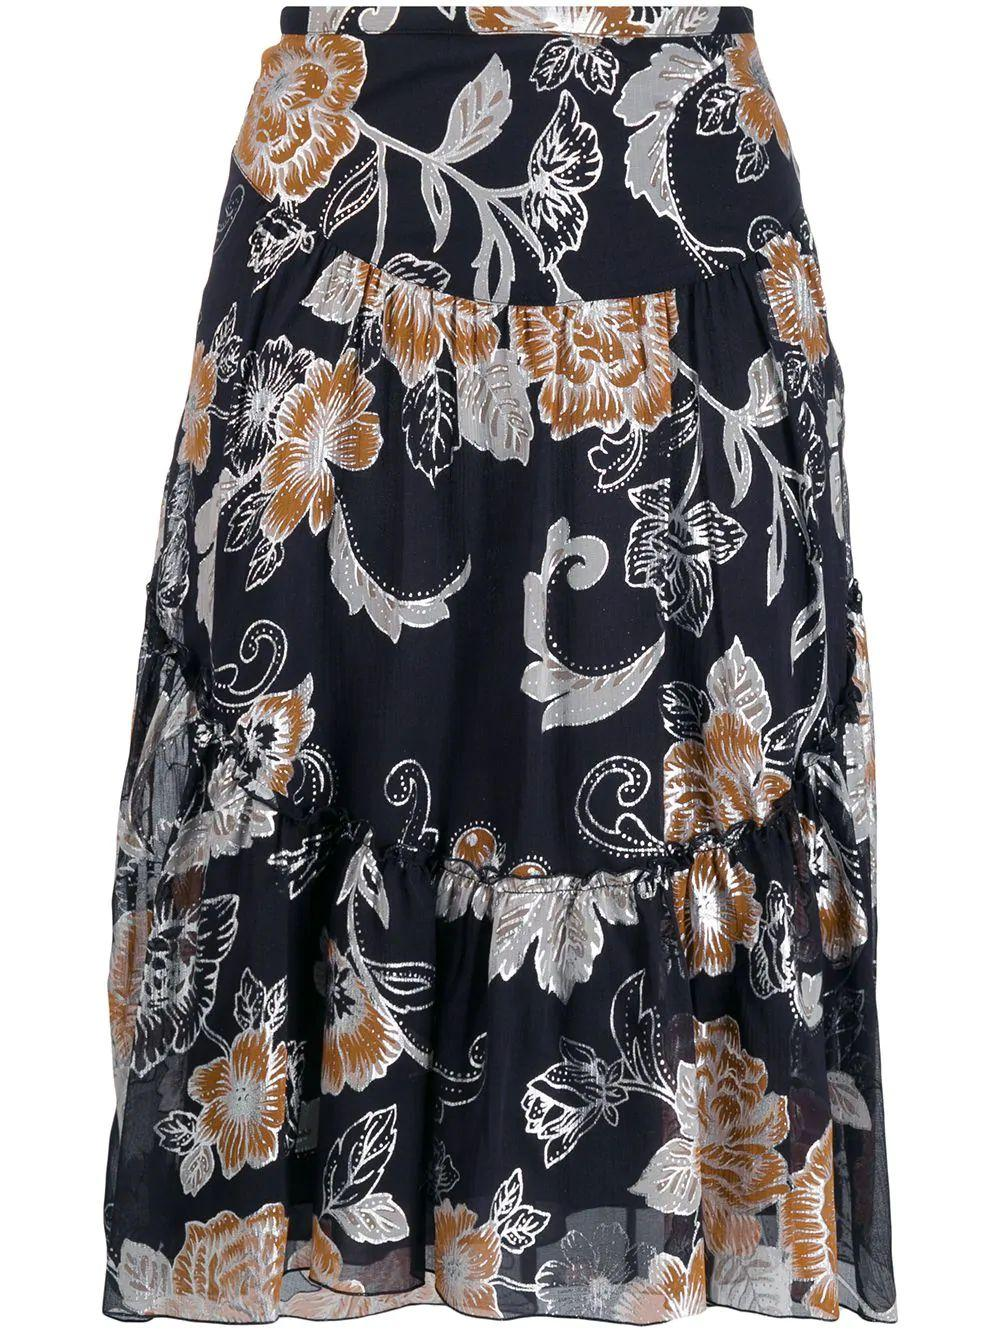 Floral Jacquard Print Skirt Item # CHS19AJU05022